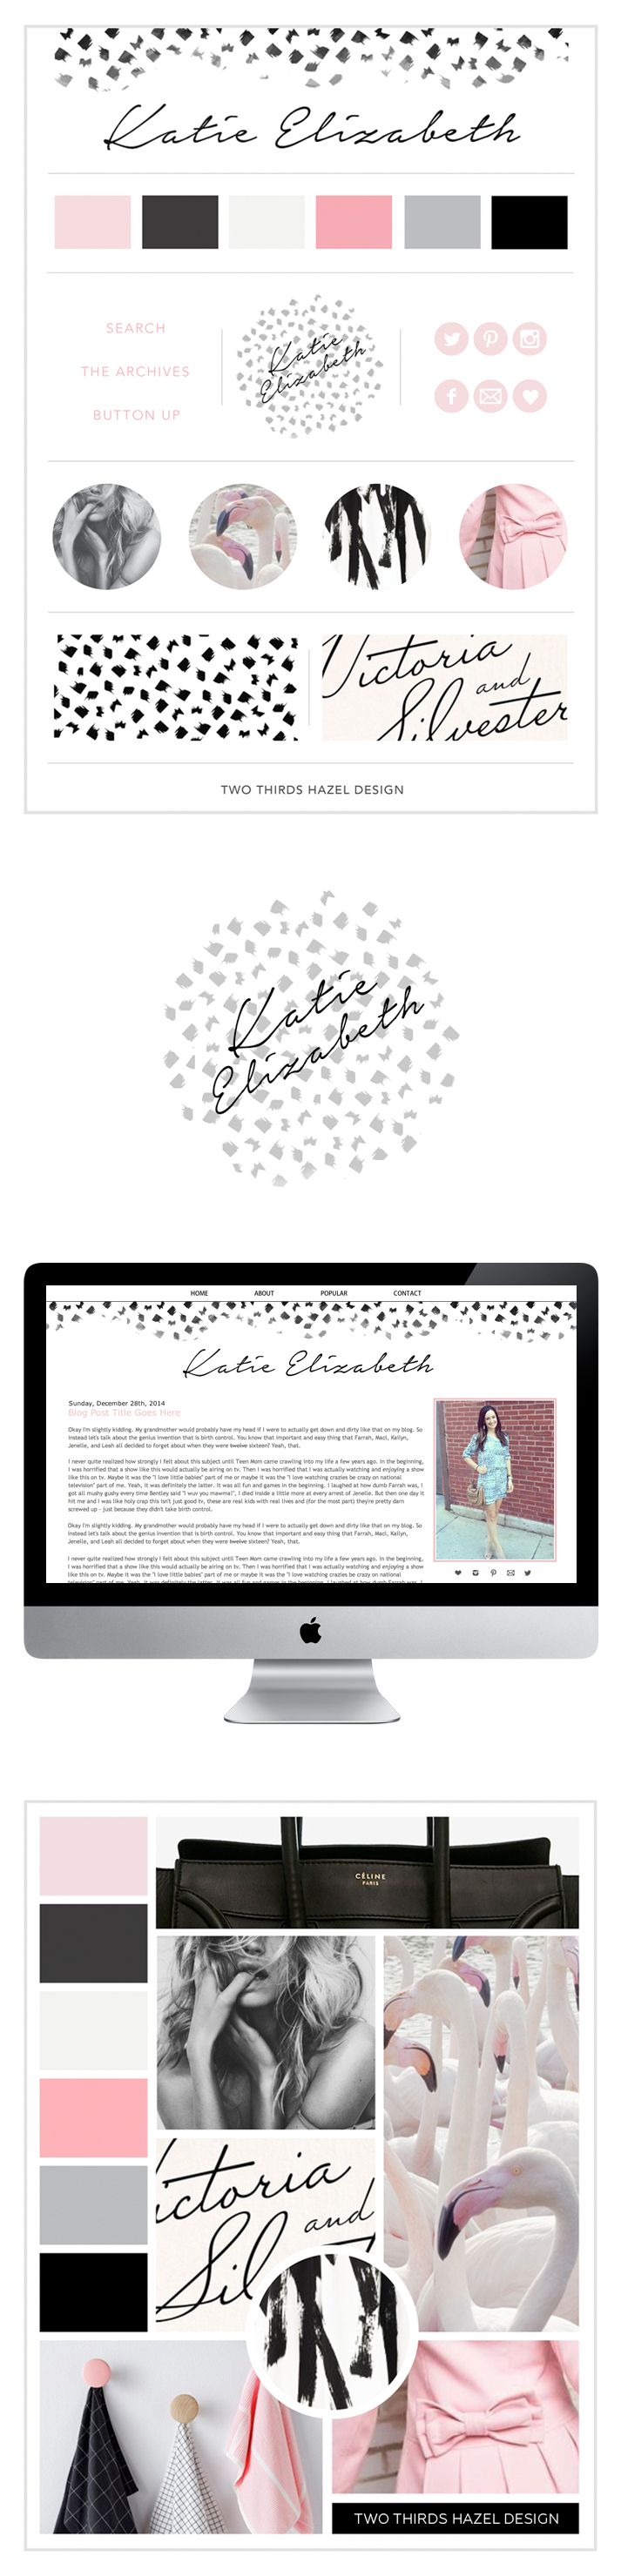 Pink and black blog design. Mood board. Brand board. Girly graphic design. Preppy website design. Black and white pattern. Two Thirds Hazel Design.